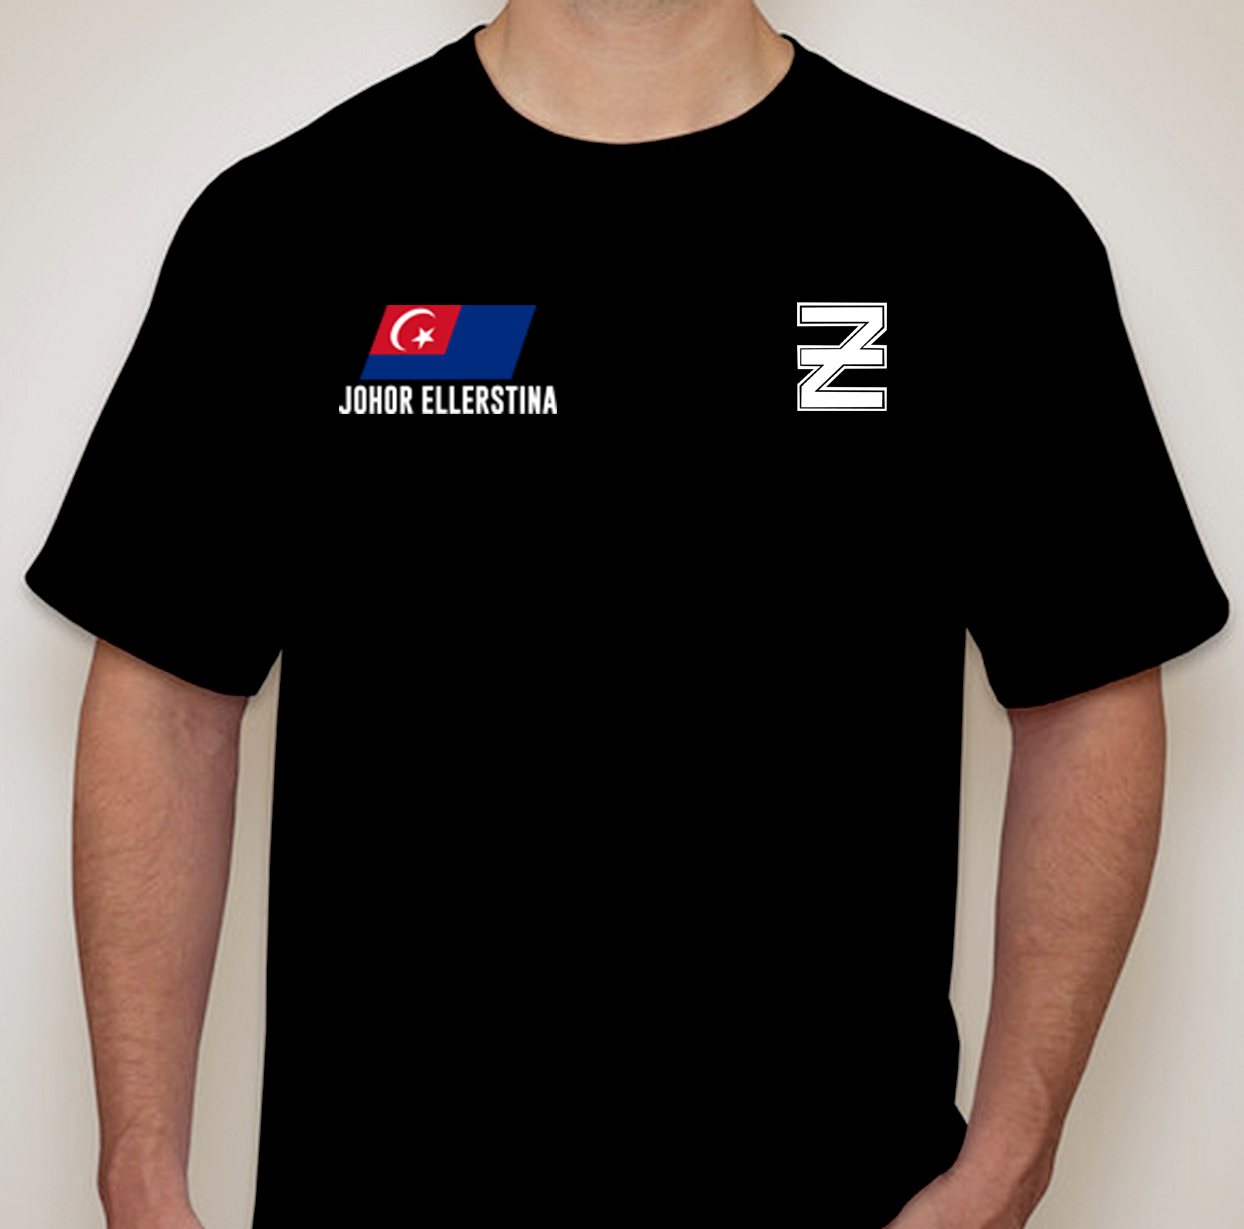 Design t shirt johor - Email Teeshirtshop2 Gmail Com